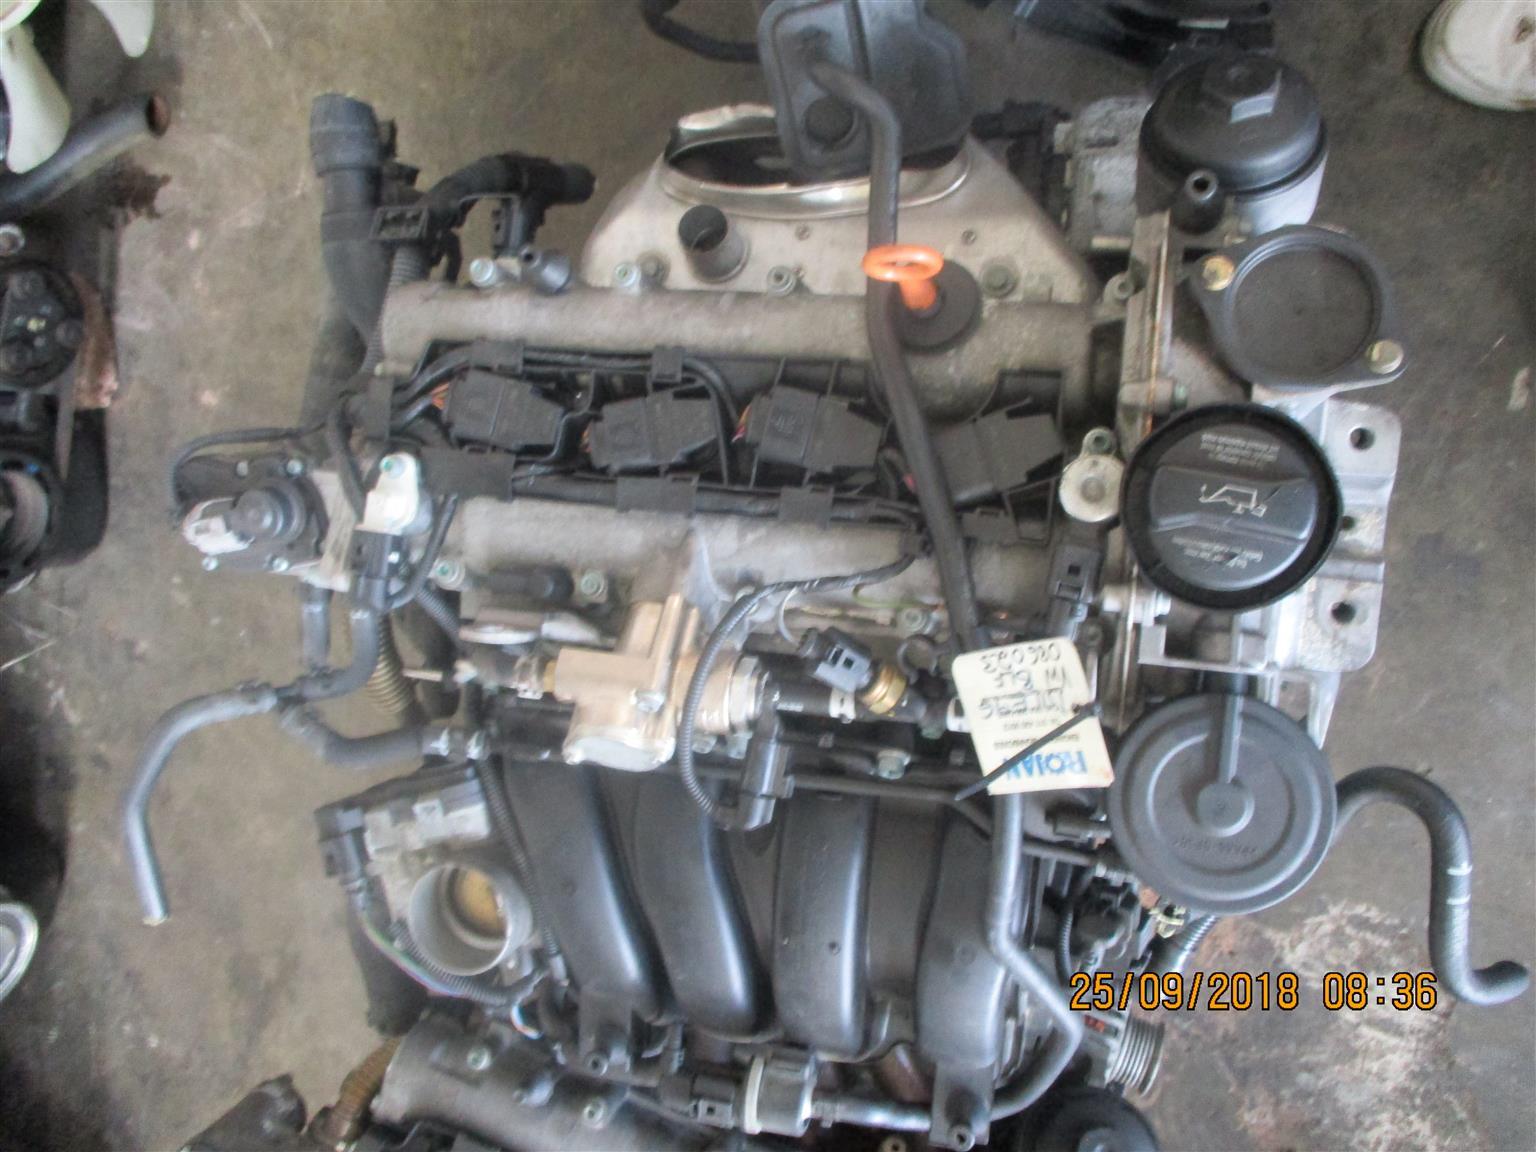 VW Golf 5 1 6 FSi Engine for Sale